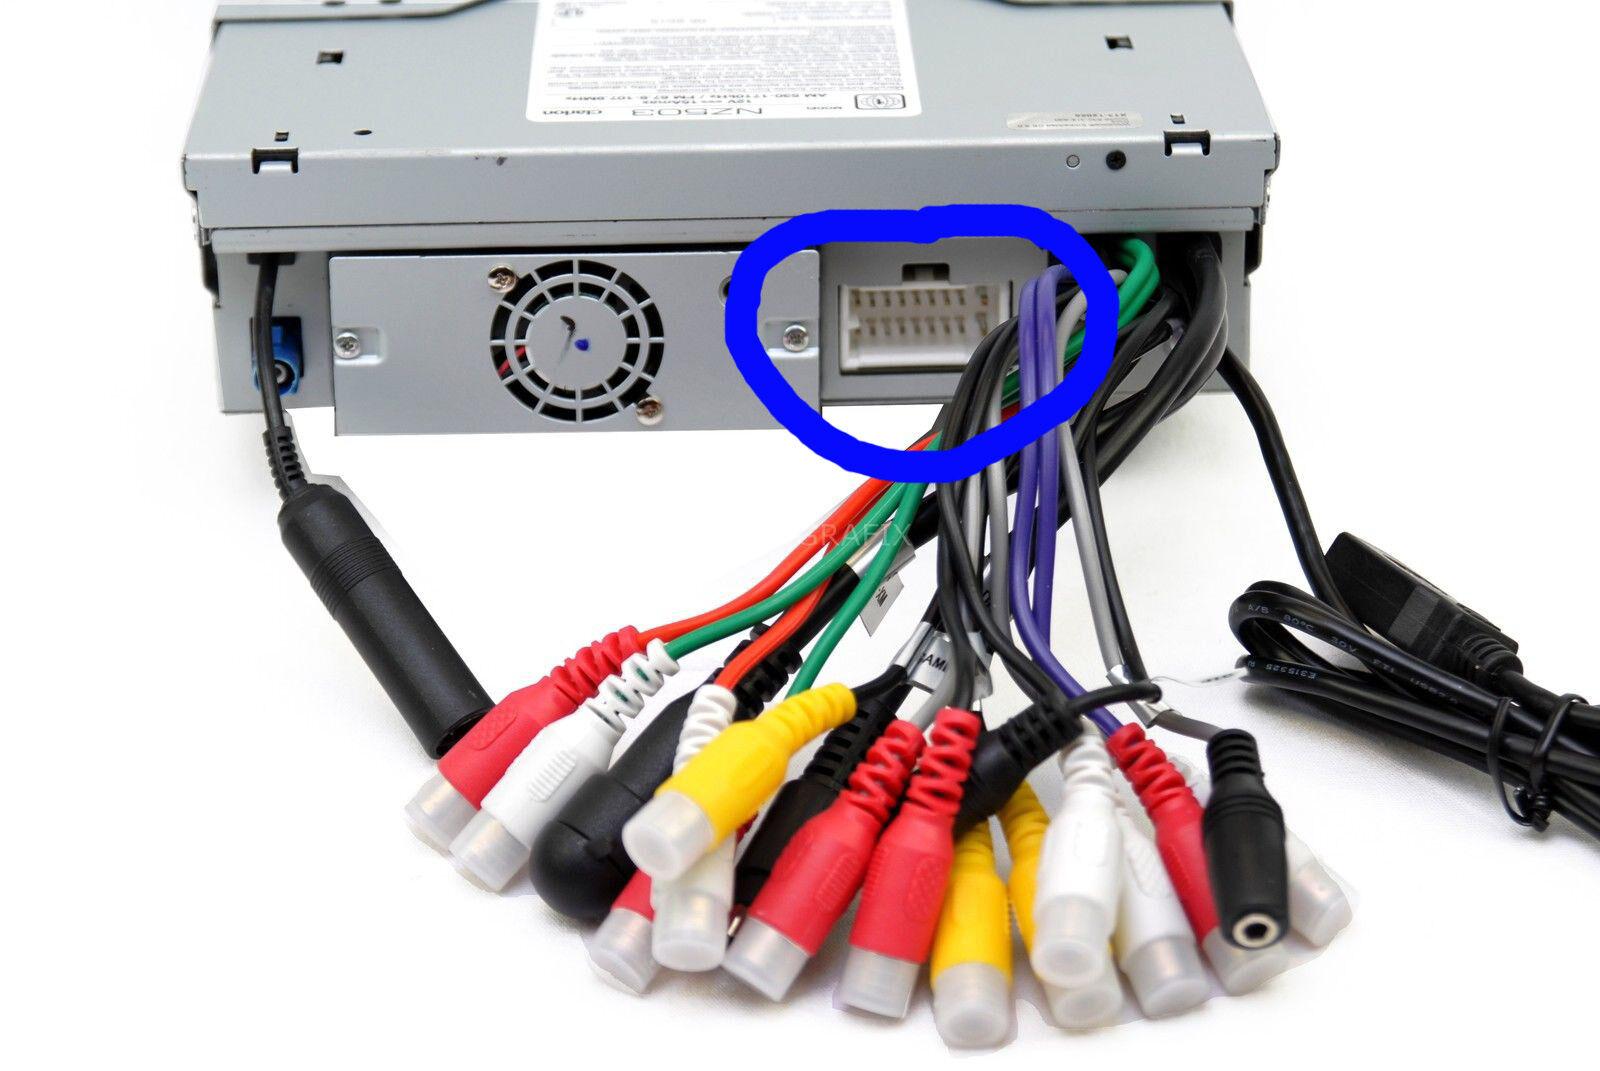 clarion cmd6 wiring diagram honeywell he360a furnace humidifier cmd4 16 pin